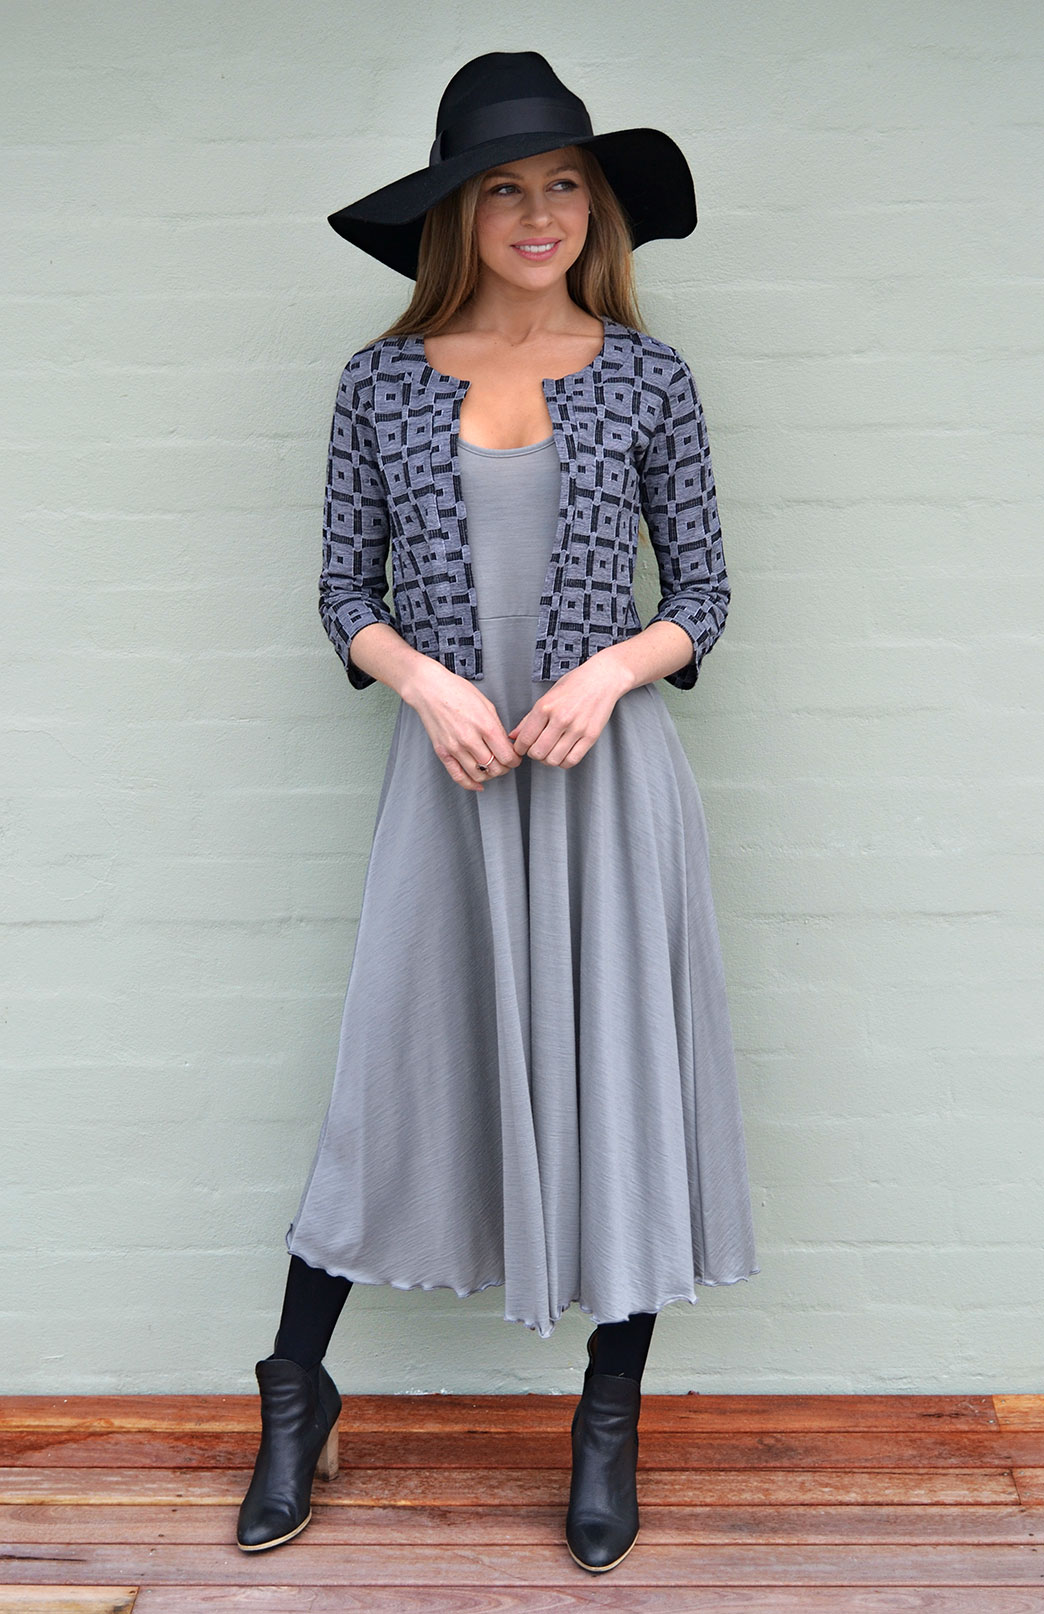 Coco Jacket - Lightweight - Women's Pure Wool Black and Grey Cropped Bolero Jacket - Smitten Merino Tasmania Australia